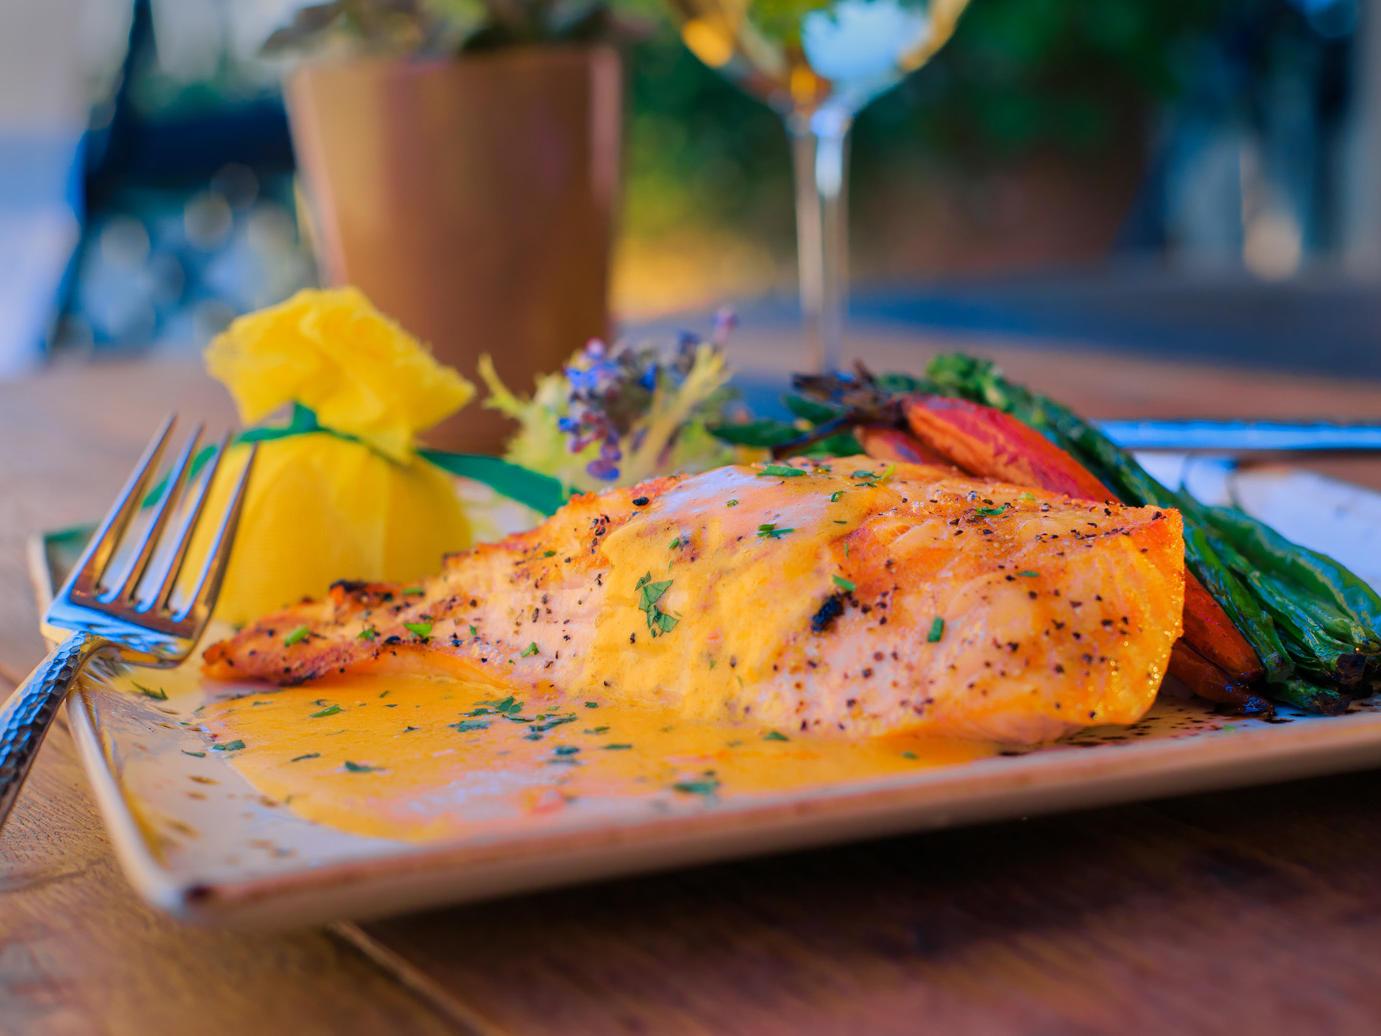 Salmon and veggie entree